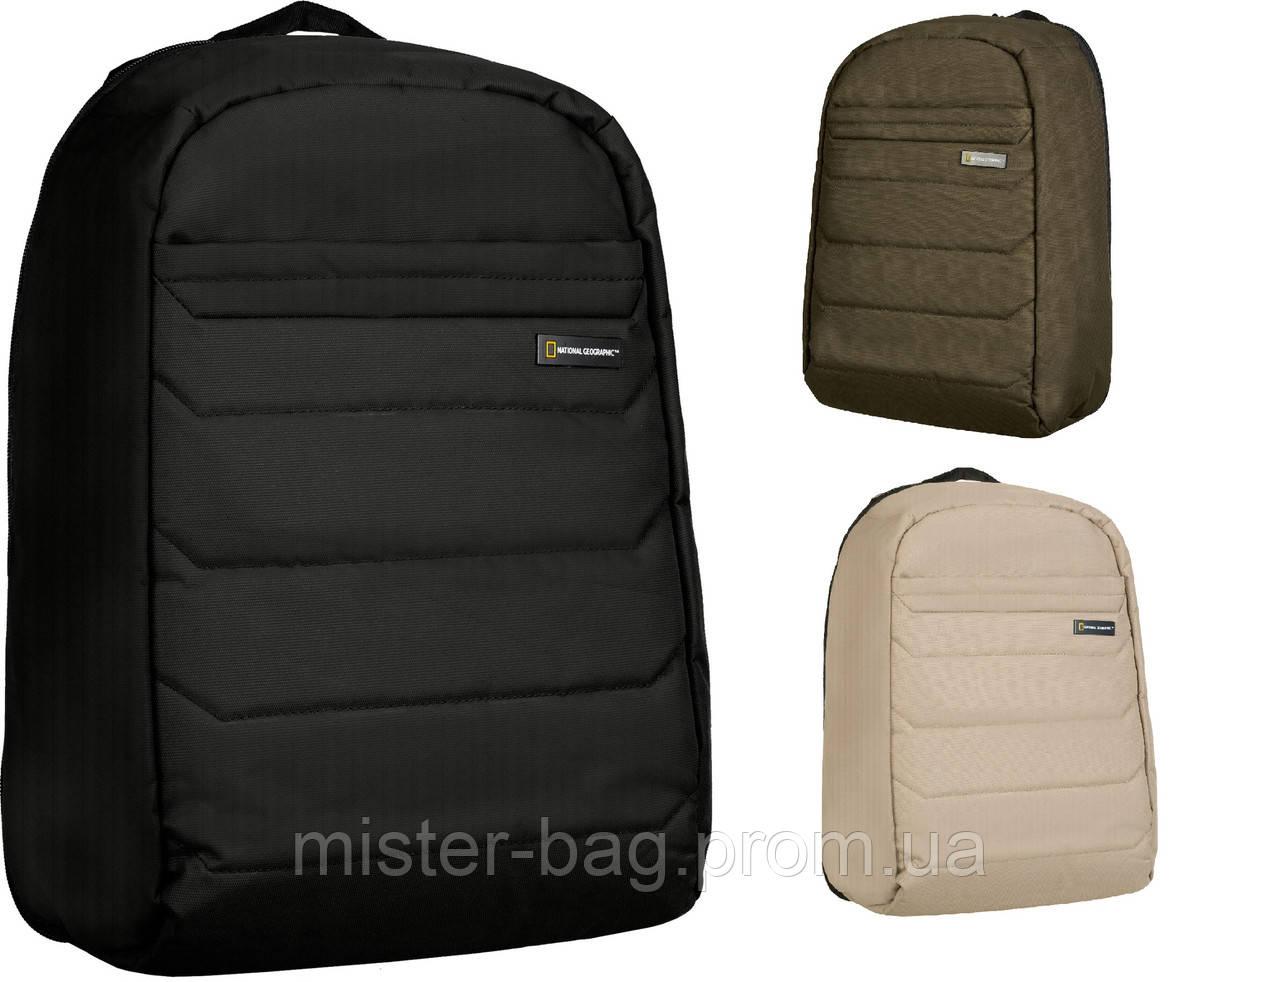 ac74a3b7bd36 Рюкзак с отделением для ноутбука и планшета National Geographic Pro N00724  - Специализированный магазин сумок